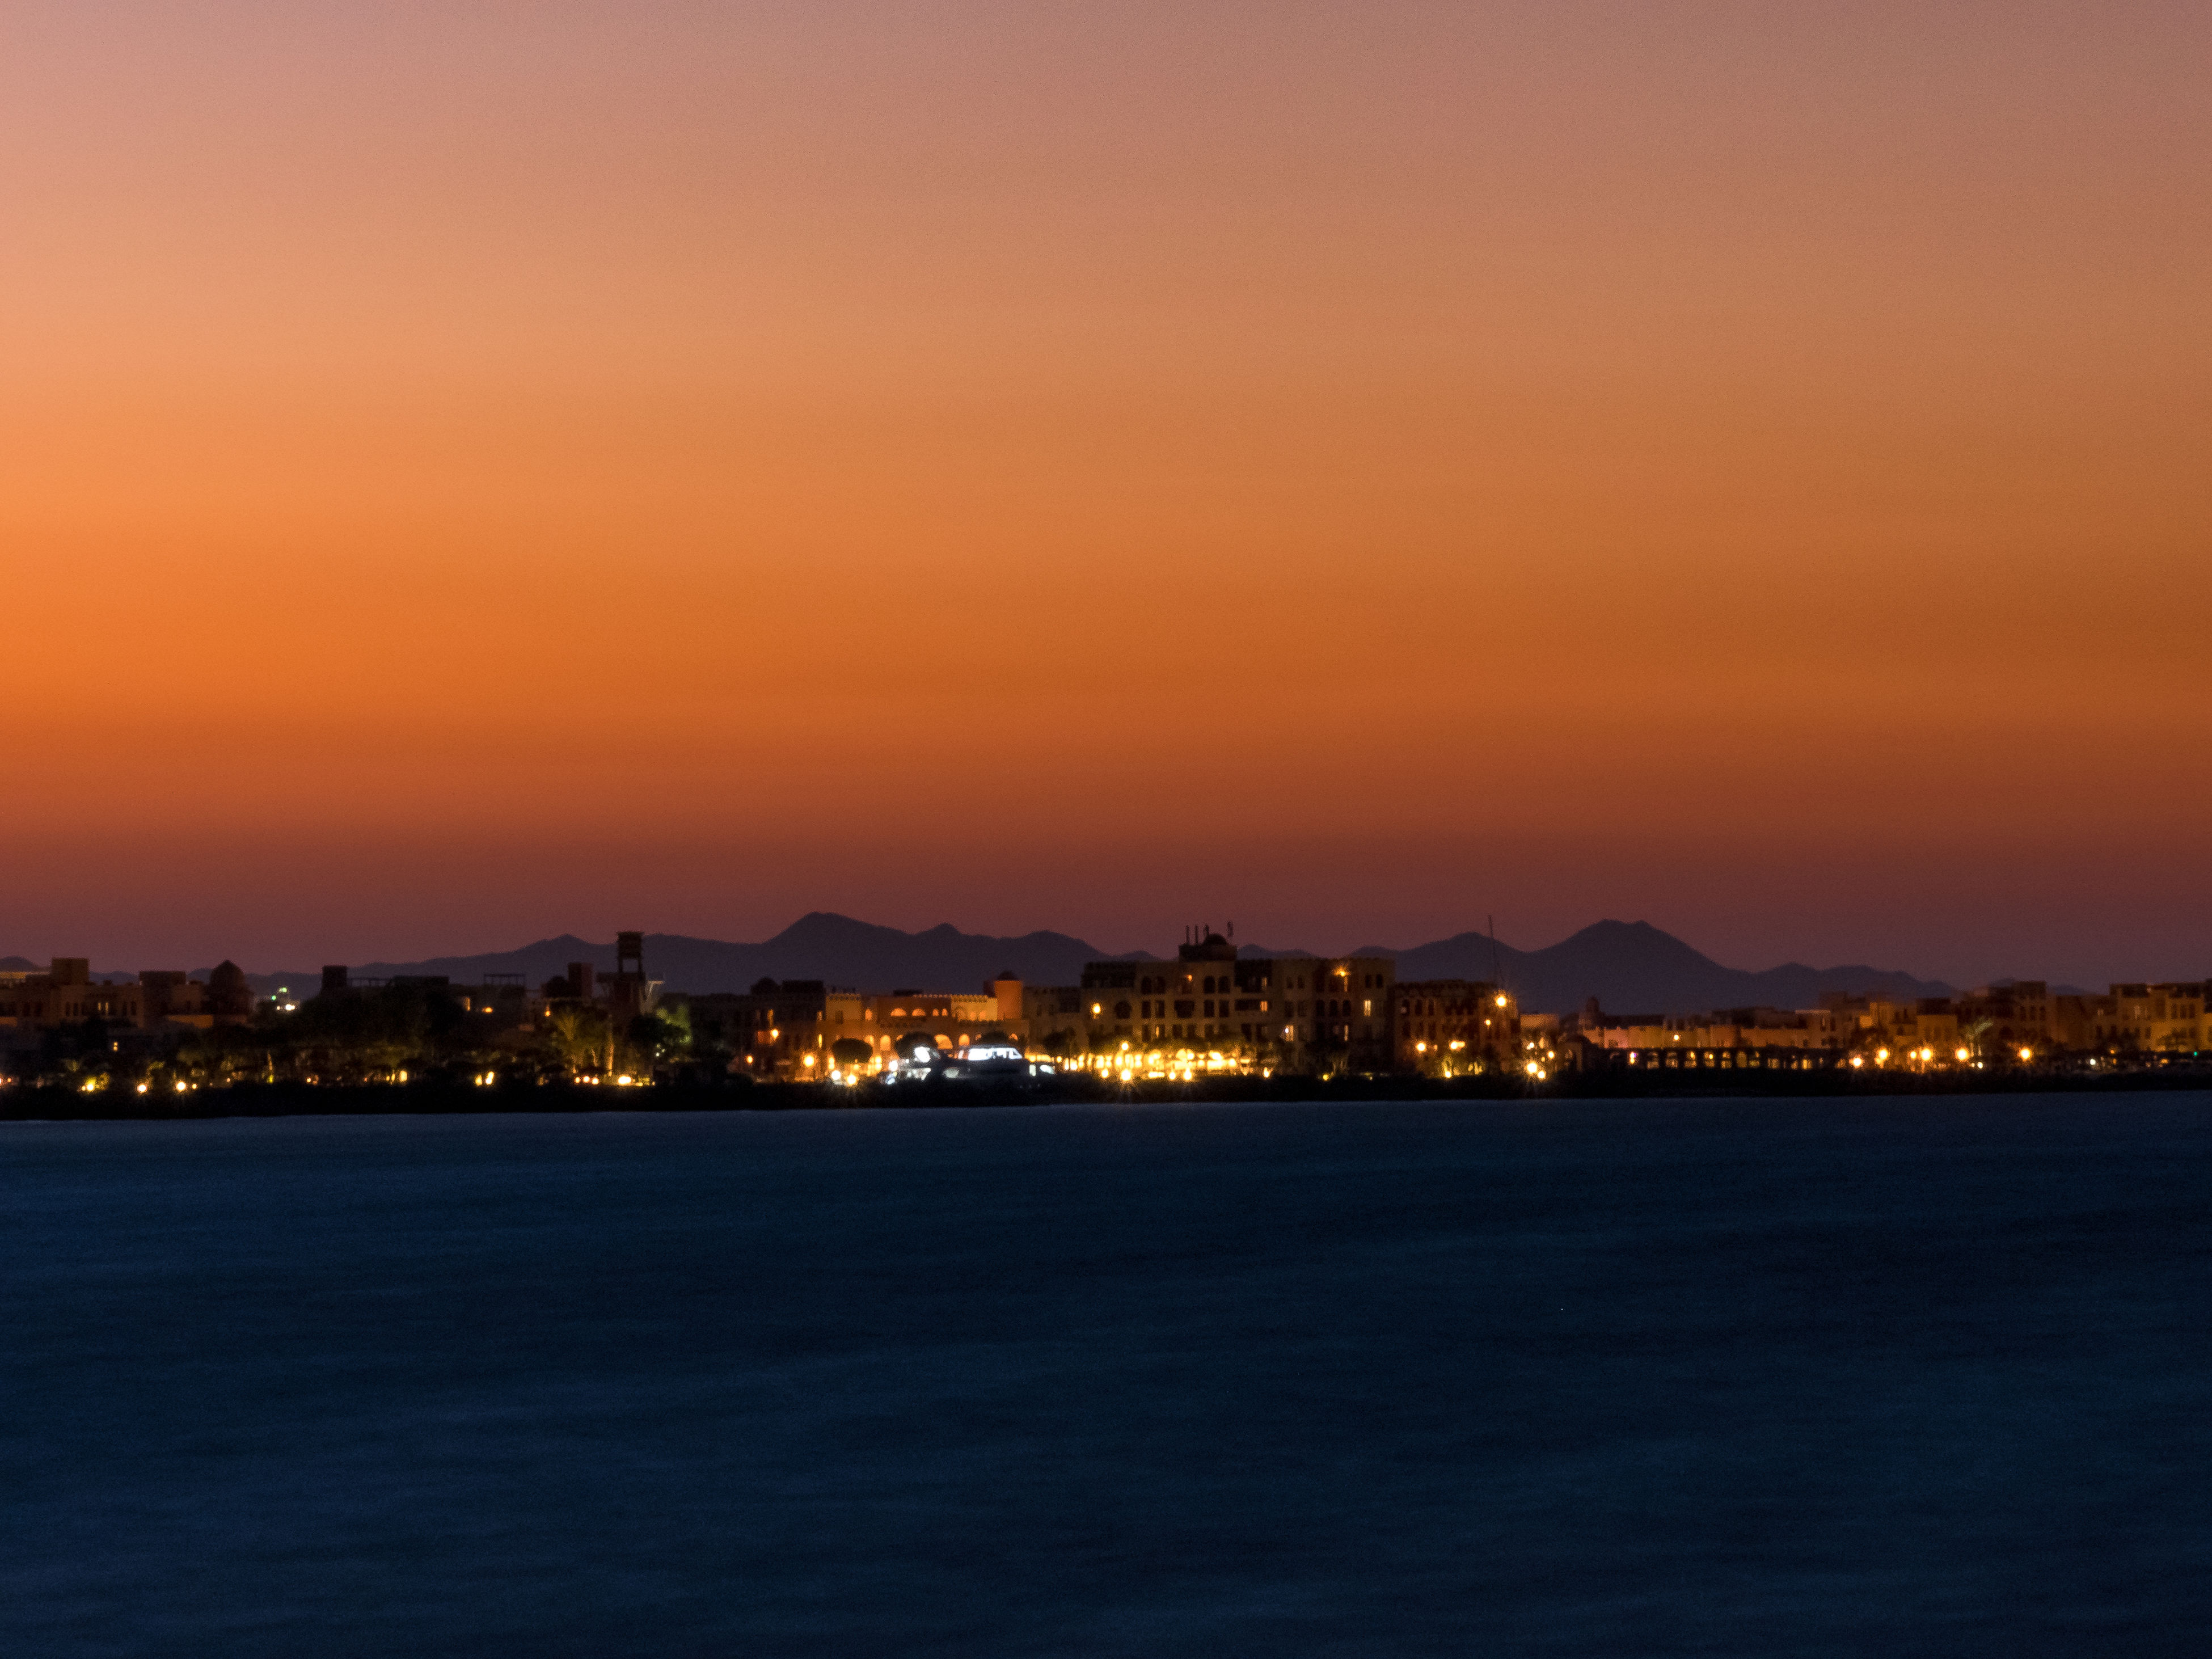 sunset, illuminated, city, night, cityscape, reflection, dusk, sky, mountain, no people, architecture, water, scenics, sea, outdoors, beauty in nature, urban skyline, nature